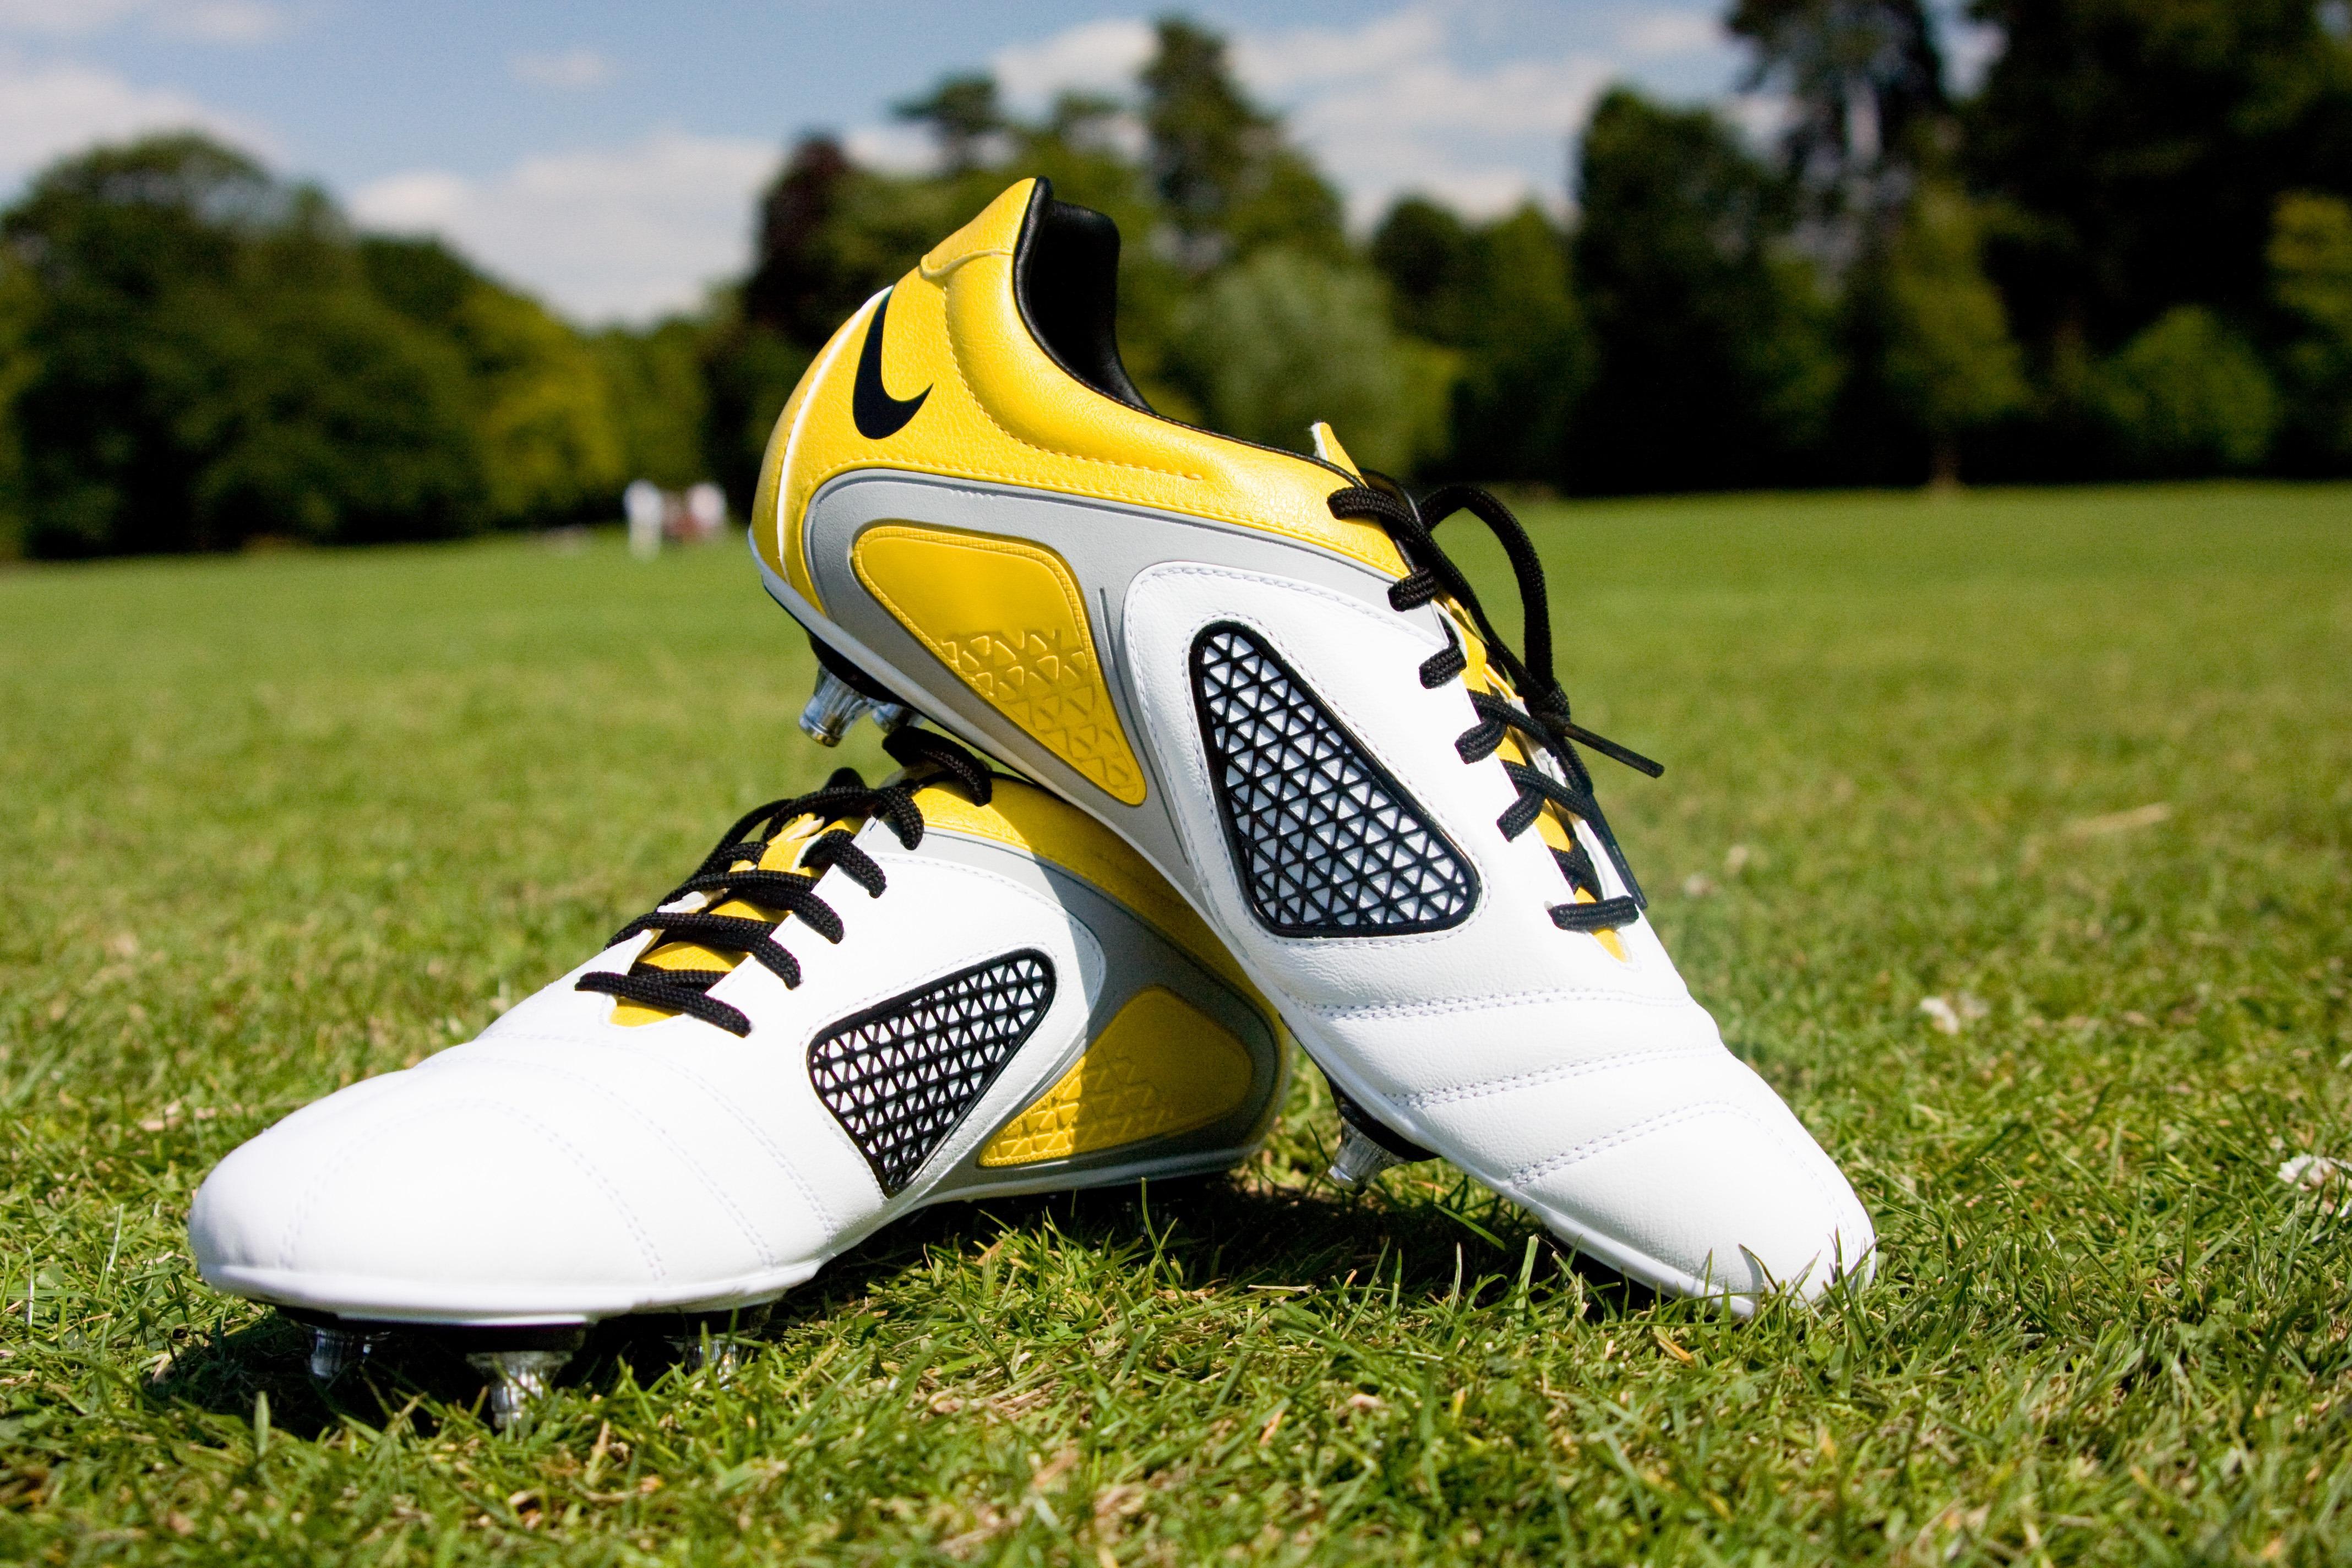 Pelotas Y Chimpunes Nike Hd 1280x768: Free Images : Grass, Shoe, White, Sport, Field, Lawn, Cup